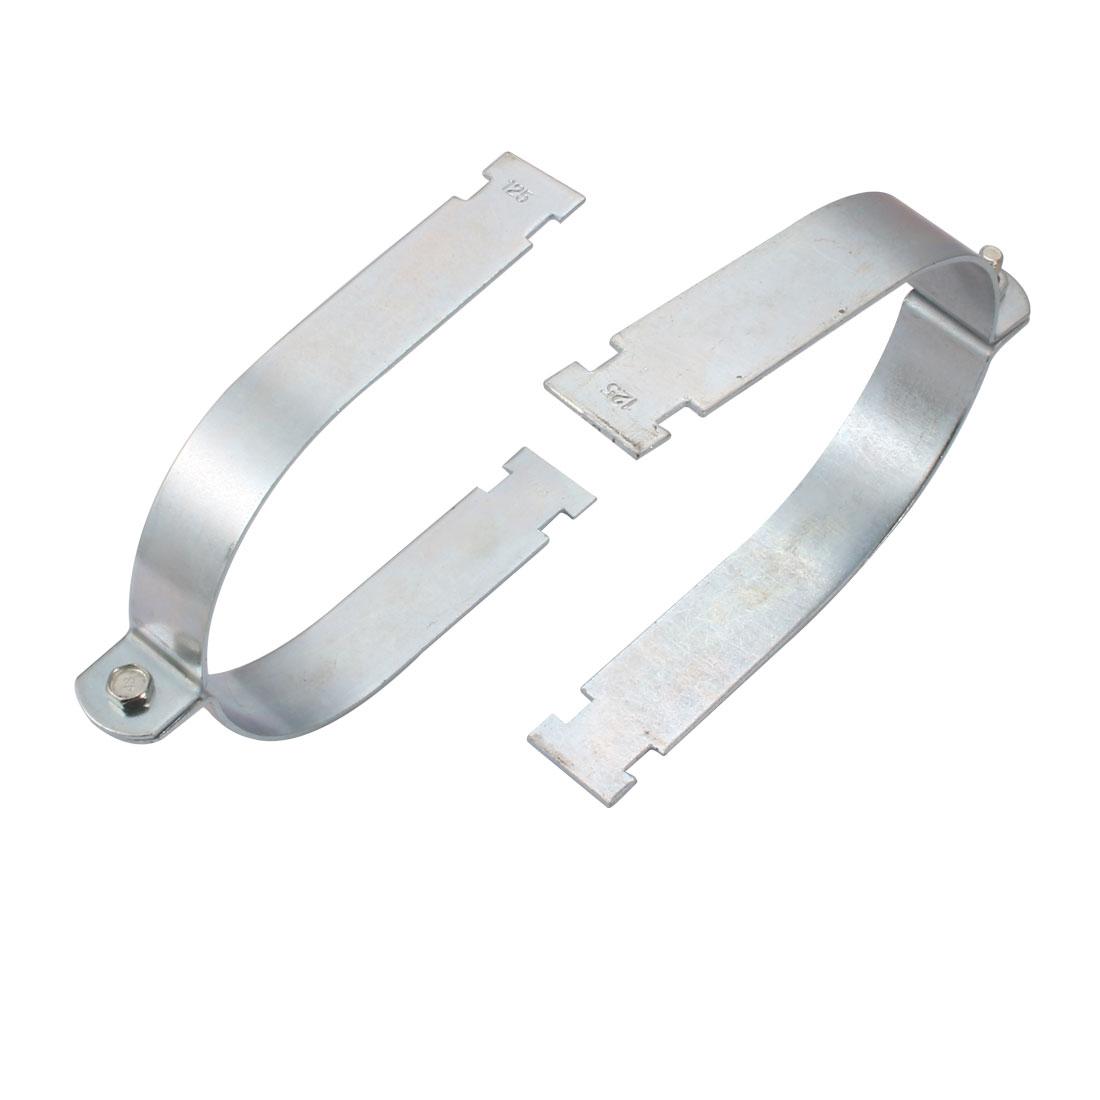 2Pcs Rigid Steel Conduit Strut Mounted Clamp for 125mm Nominal Diameter Tube